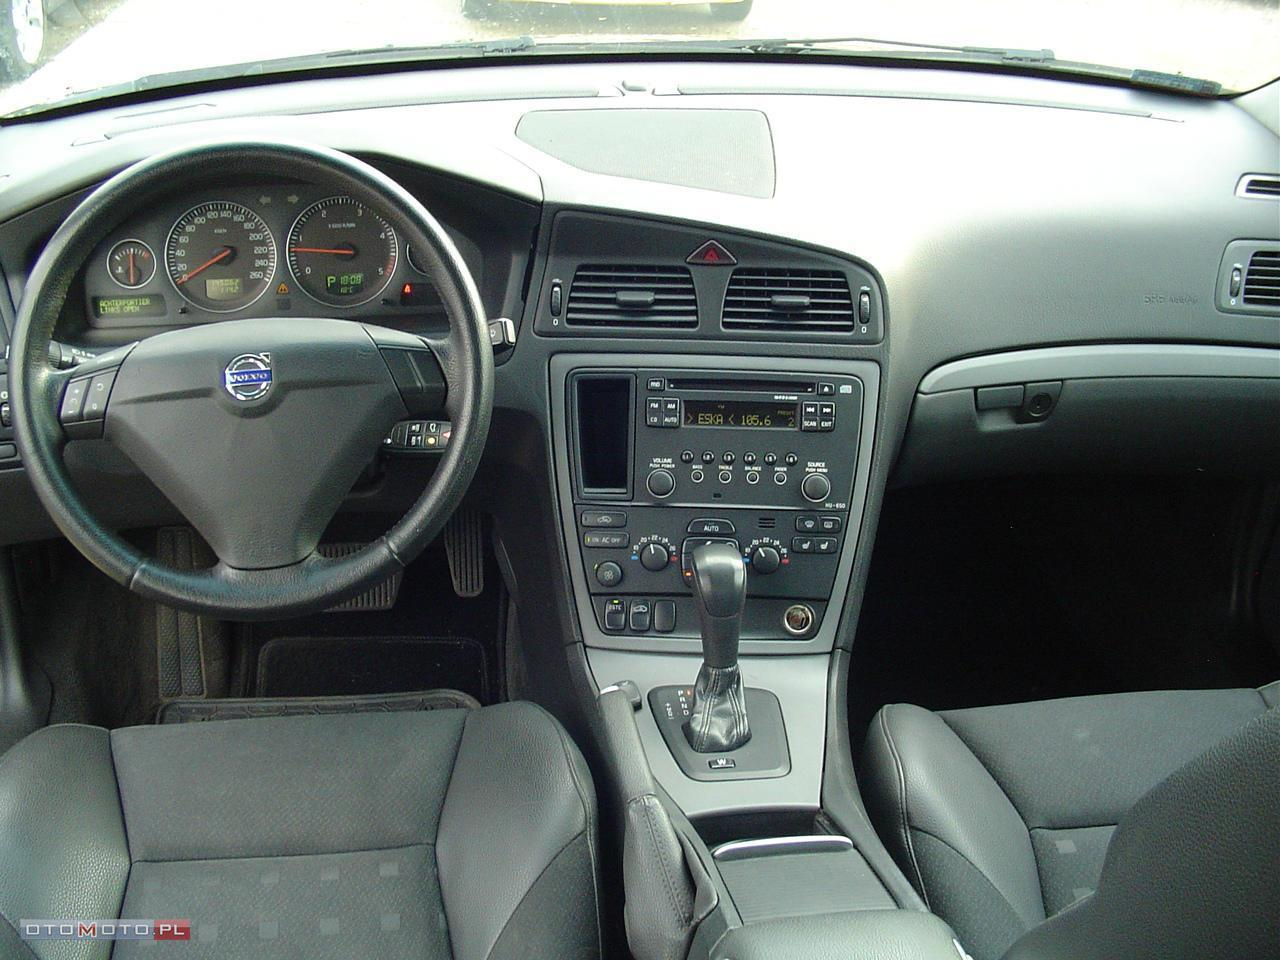 Volvo S60 2.4 D5 Automat